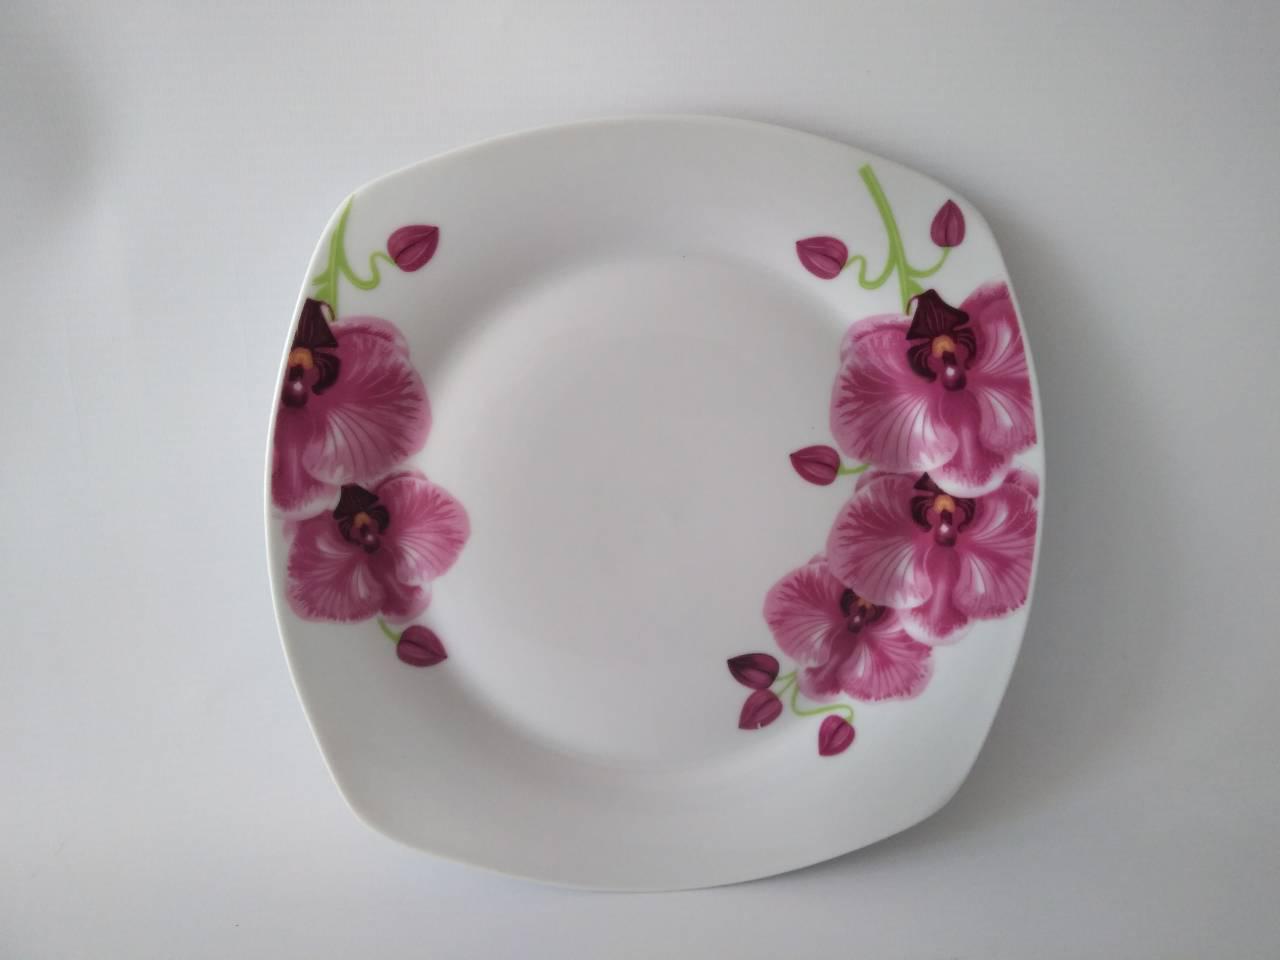 Тарелка квадратная 8мл Орхидея 17-092